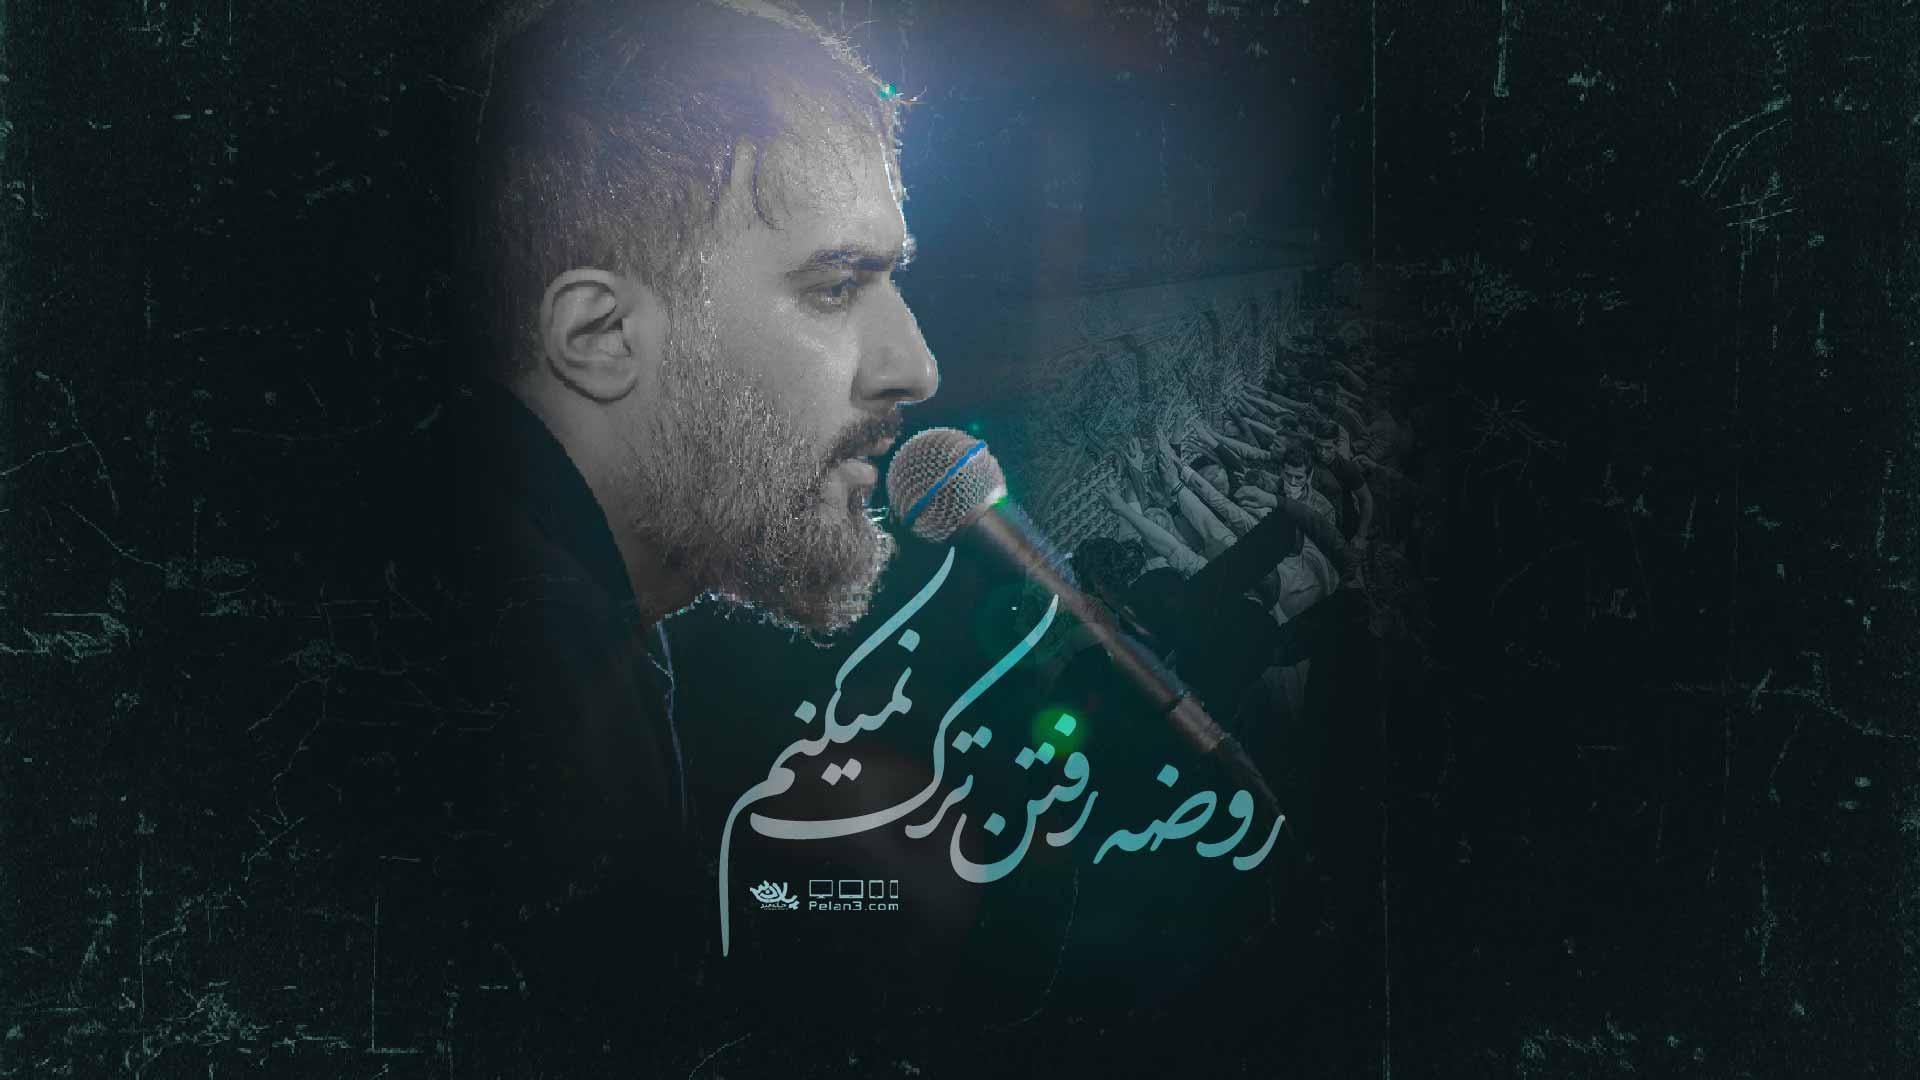 روضه رفتنو ترک نمیکنم محمدحسین پویانفر